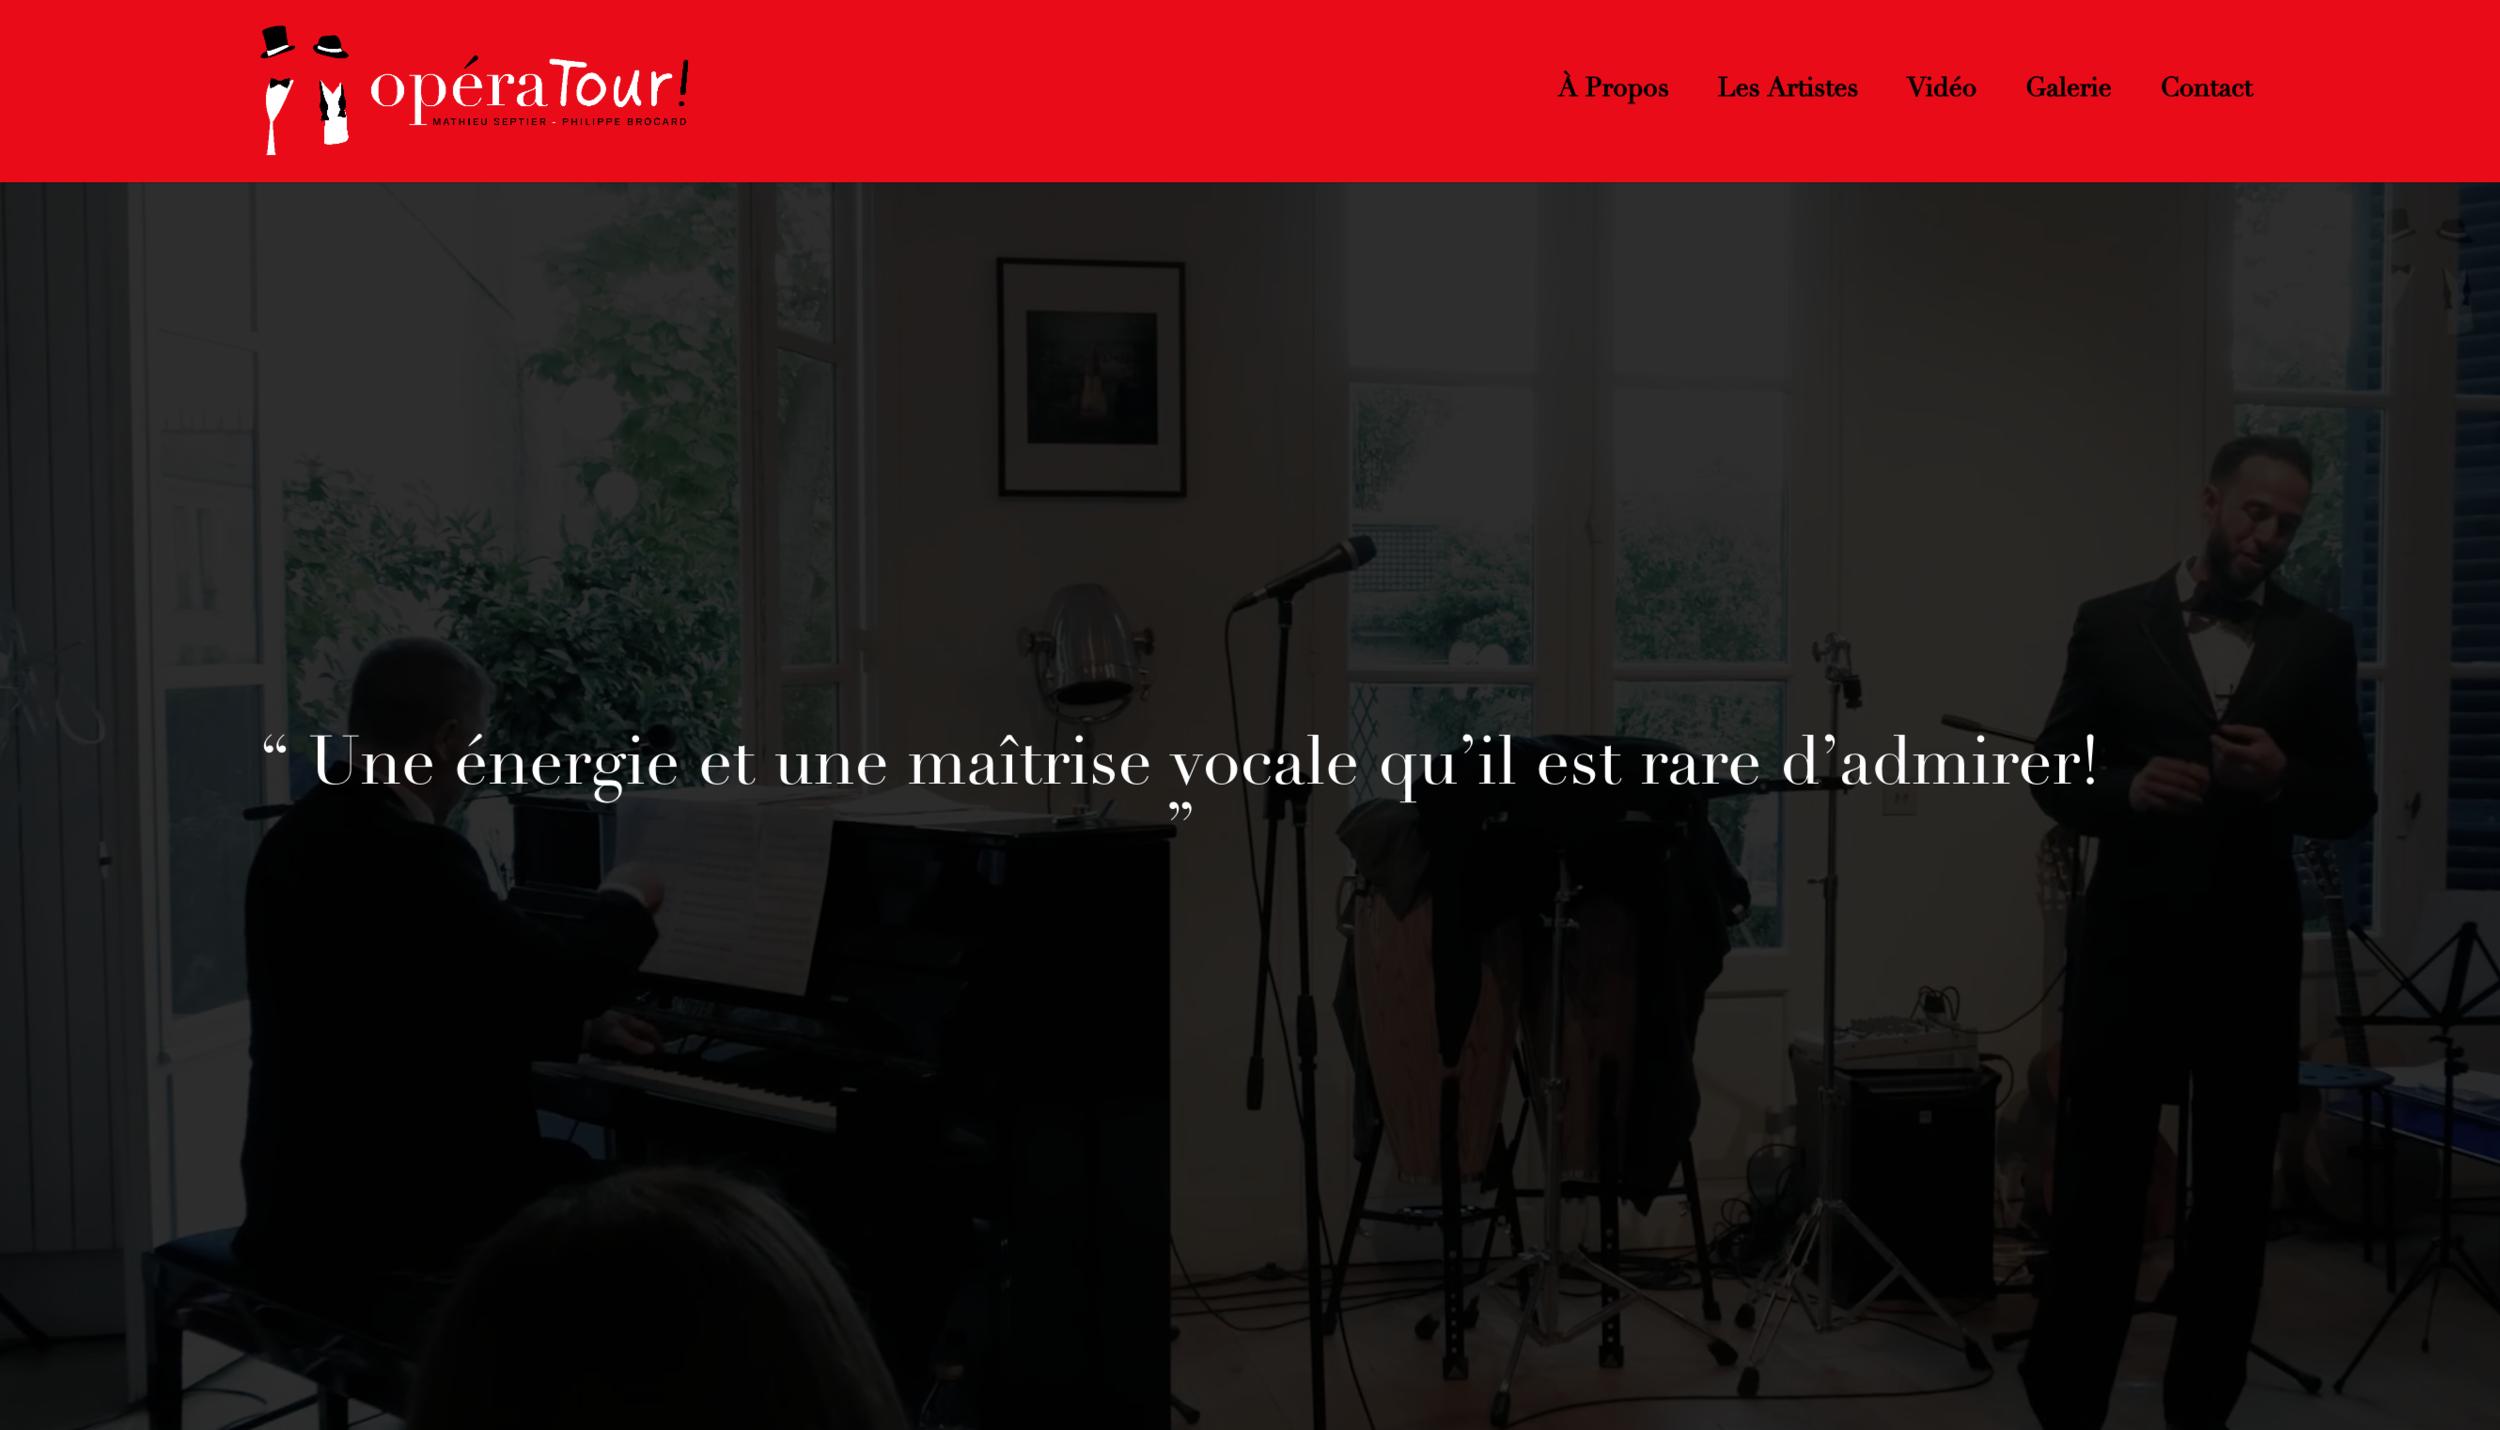 quentin_paquignon-branding-visual_identity-opératour_07.jpg